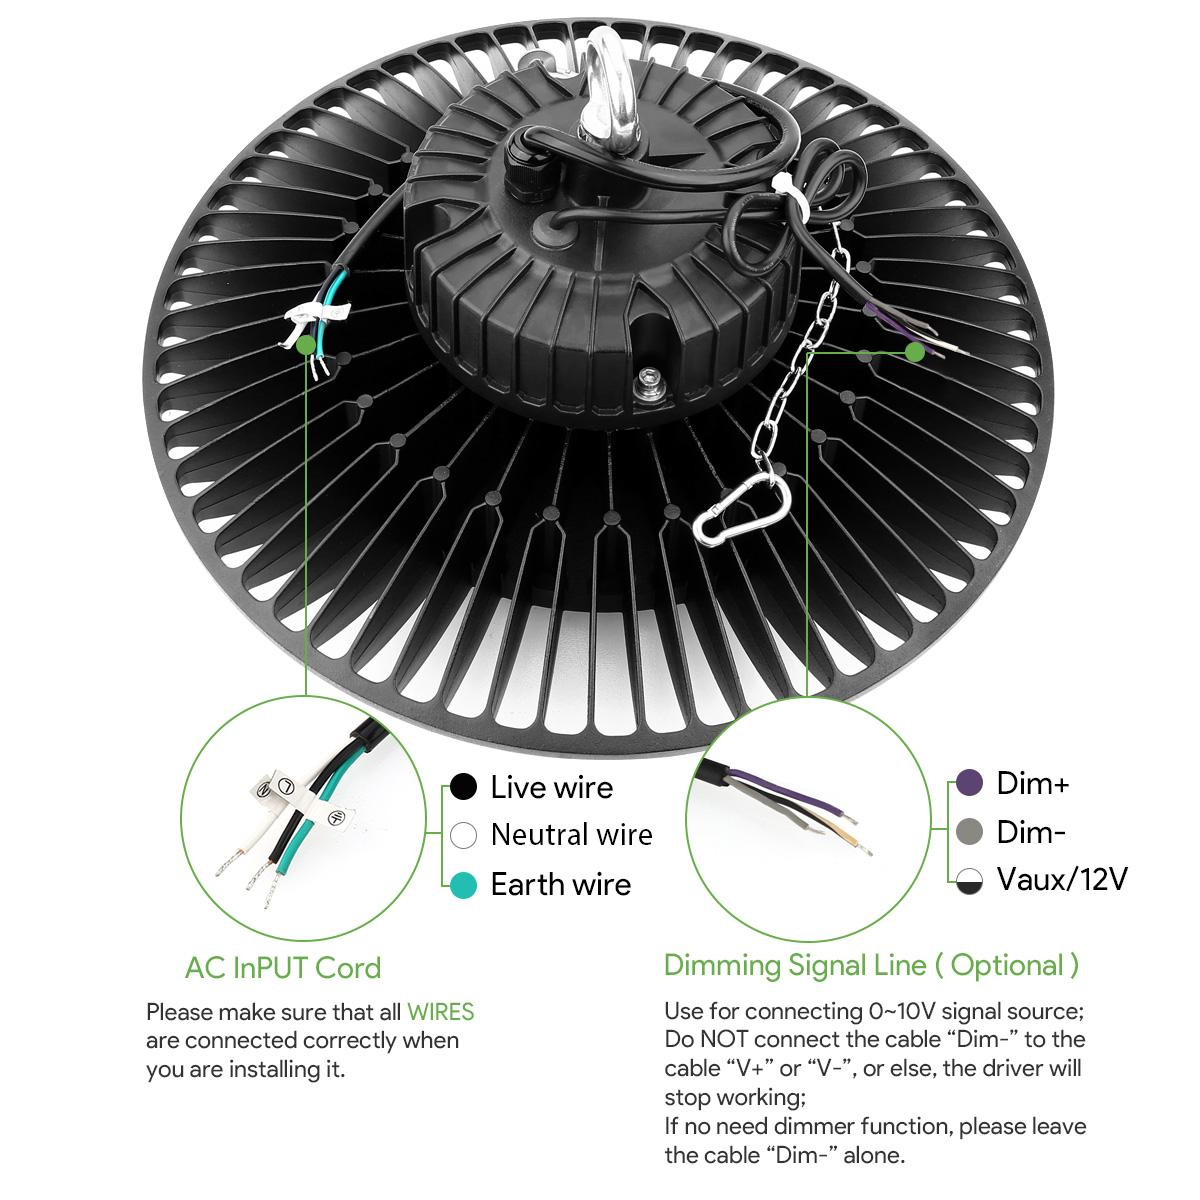 hight resolution of le 100w led high bay ufo light fixture replaced 200 watt metal halide lighting